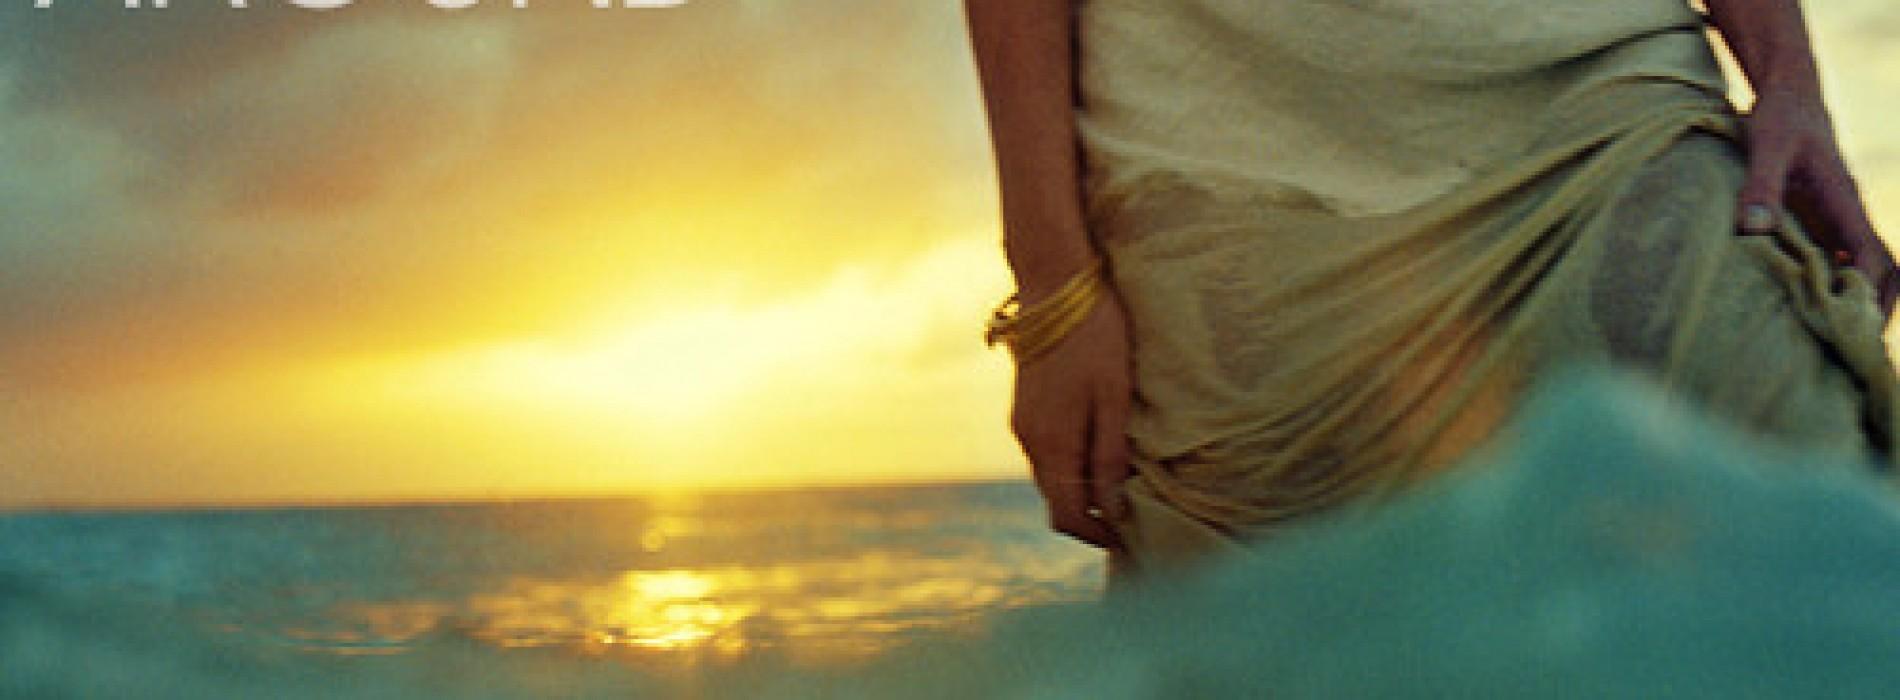 Justin Timberlake – What Goes Around (Dropwizz Dubstep Remix)